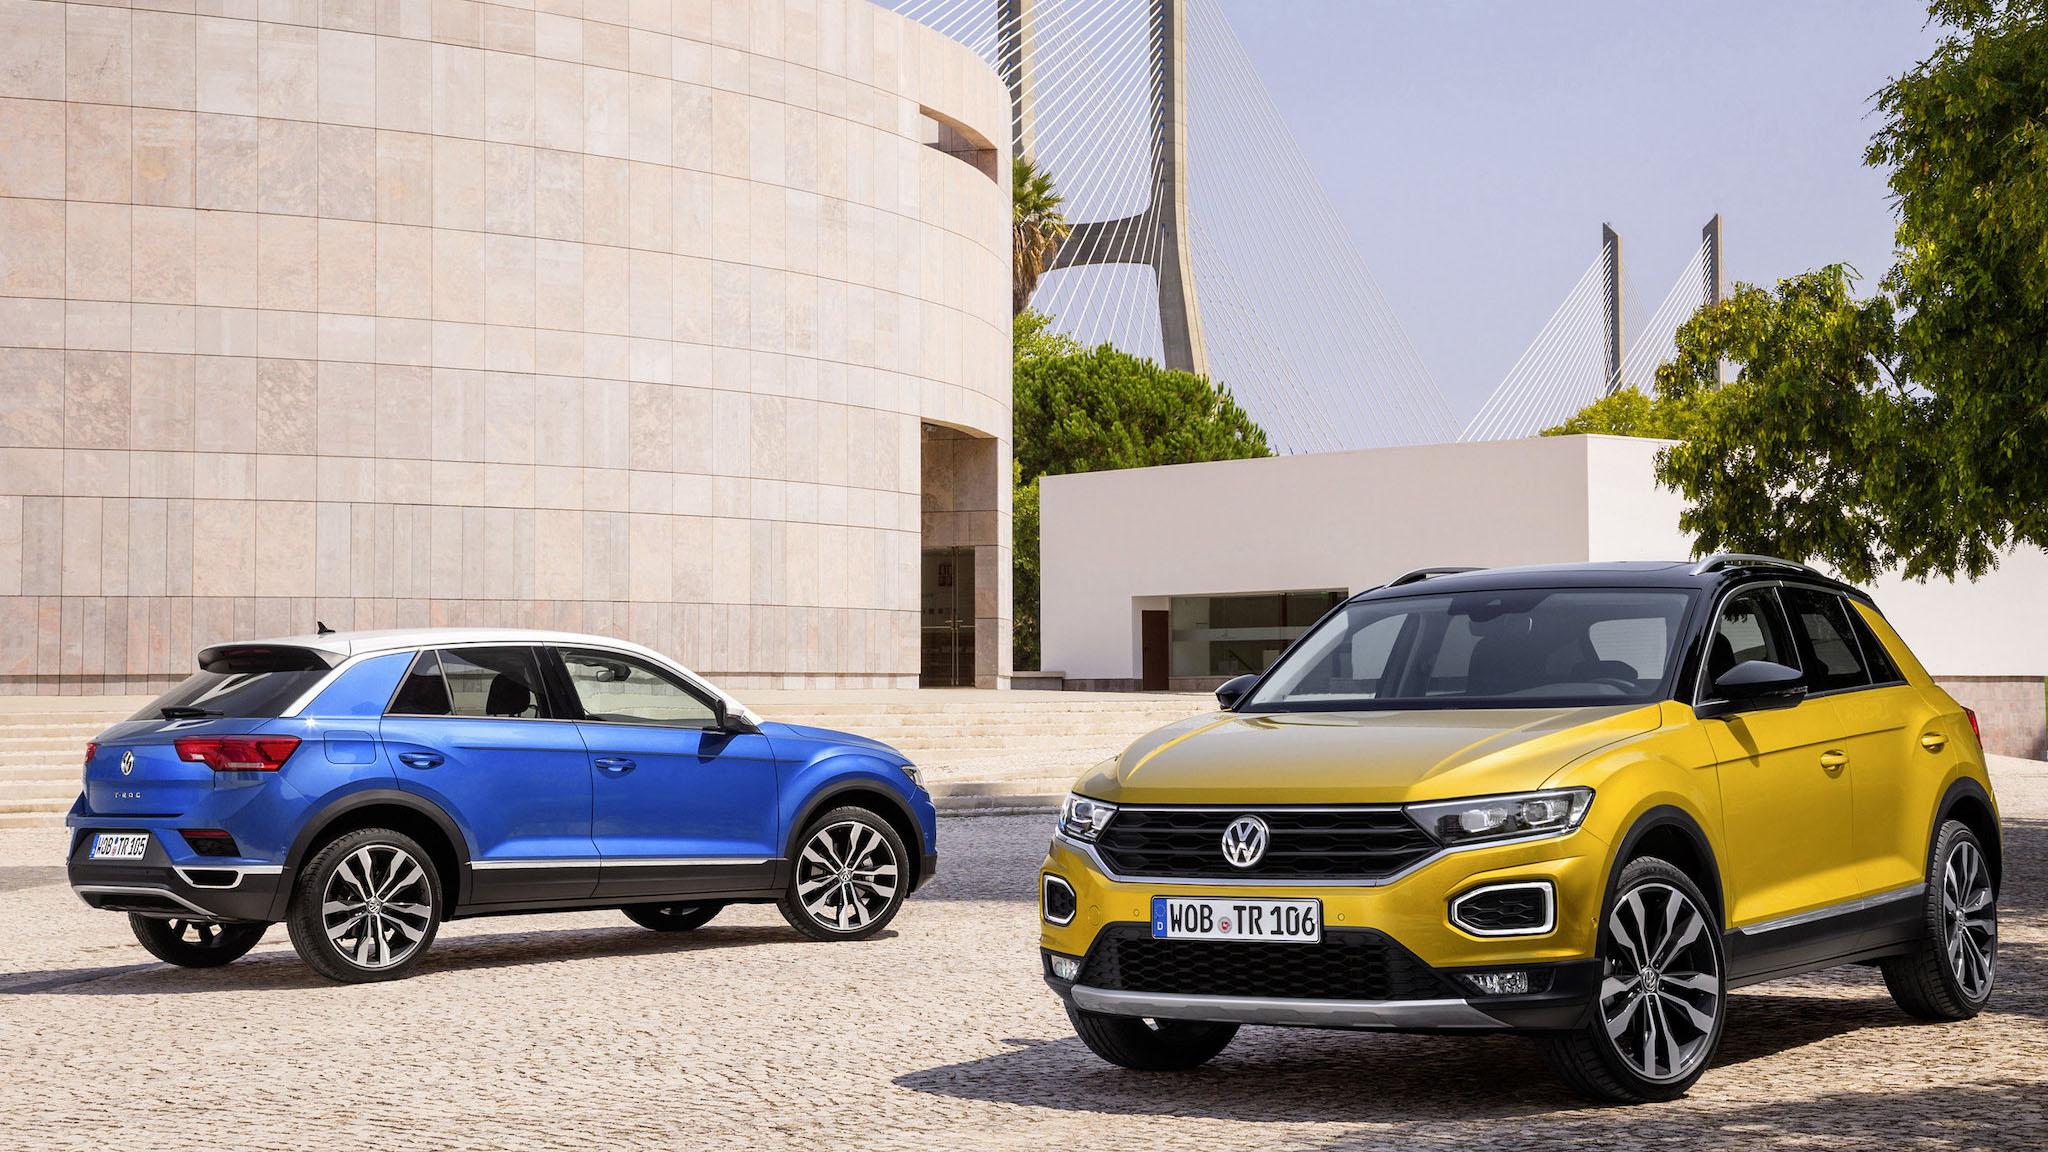 Volkswagen T-Roc 雙車型登場,限量預售 112.8 萬元起